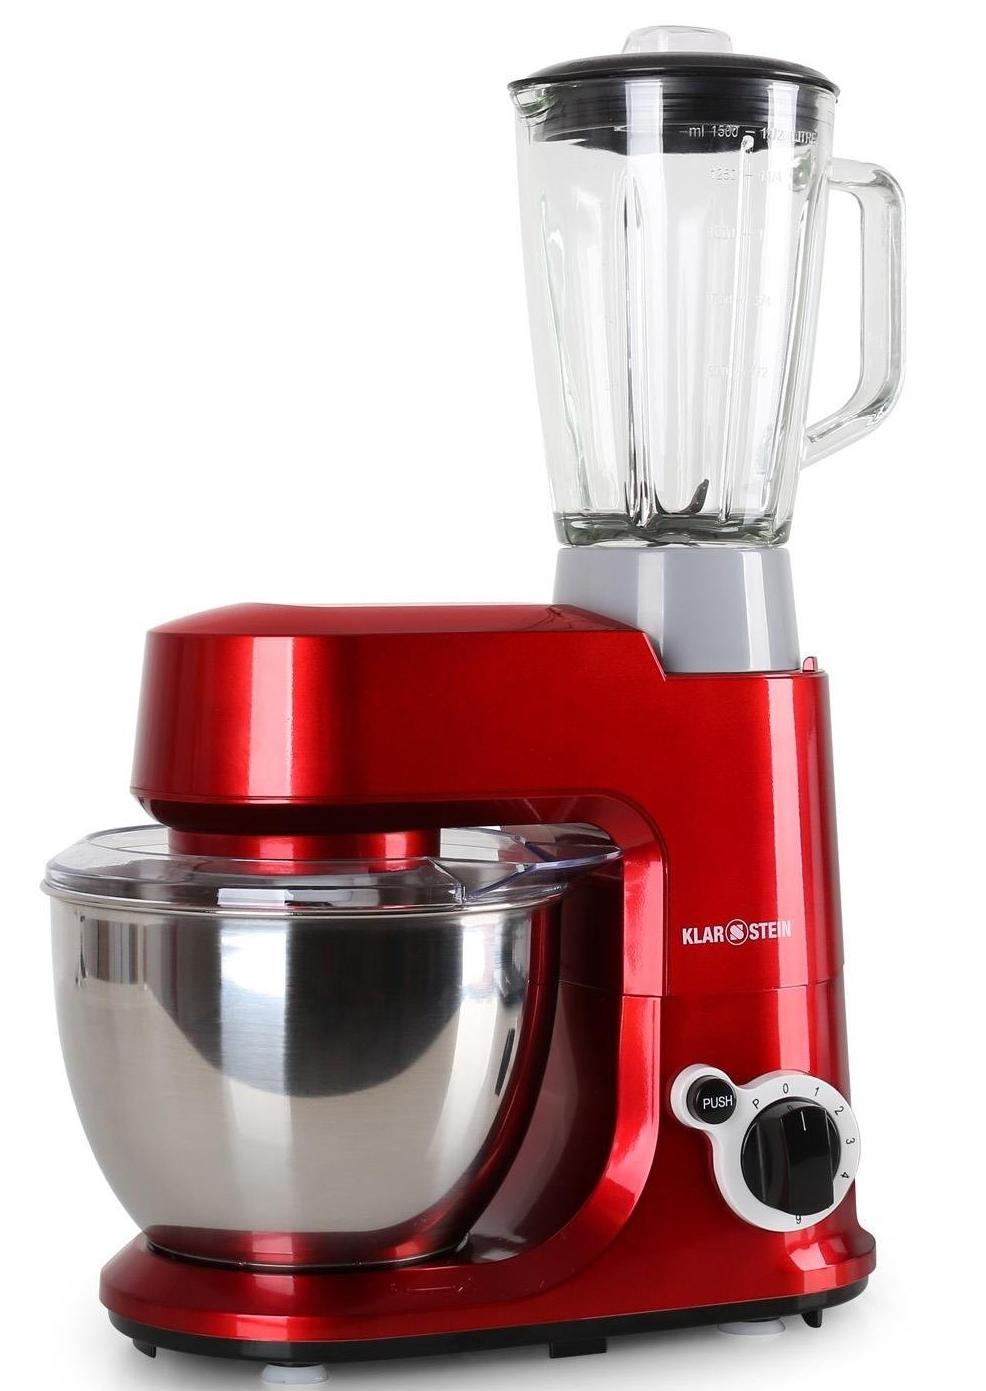 kenwood küchenmaschine wieviel watt